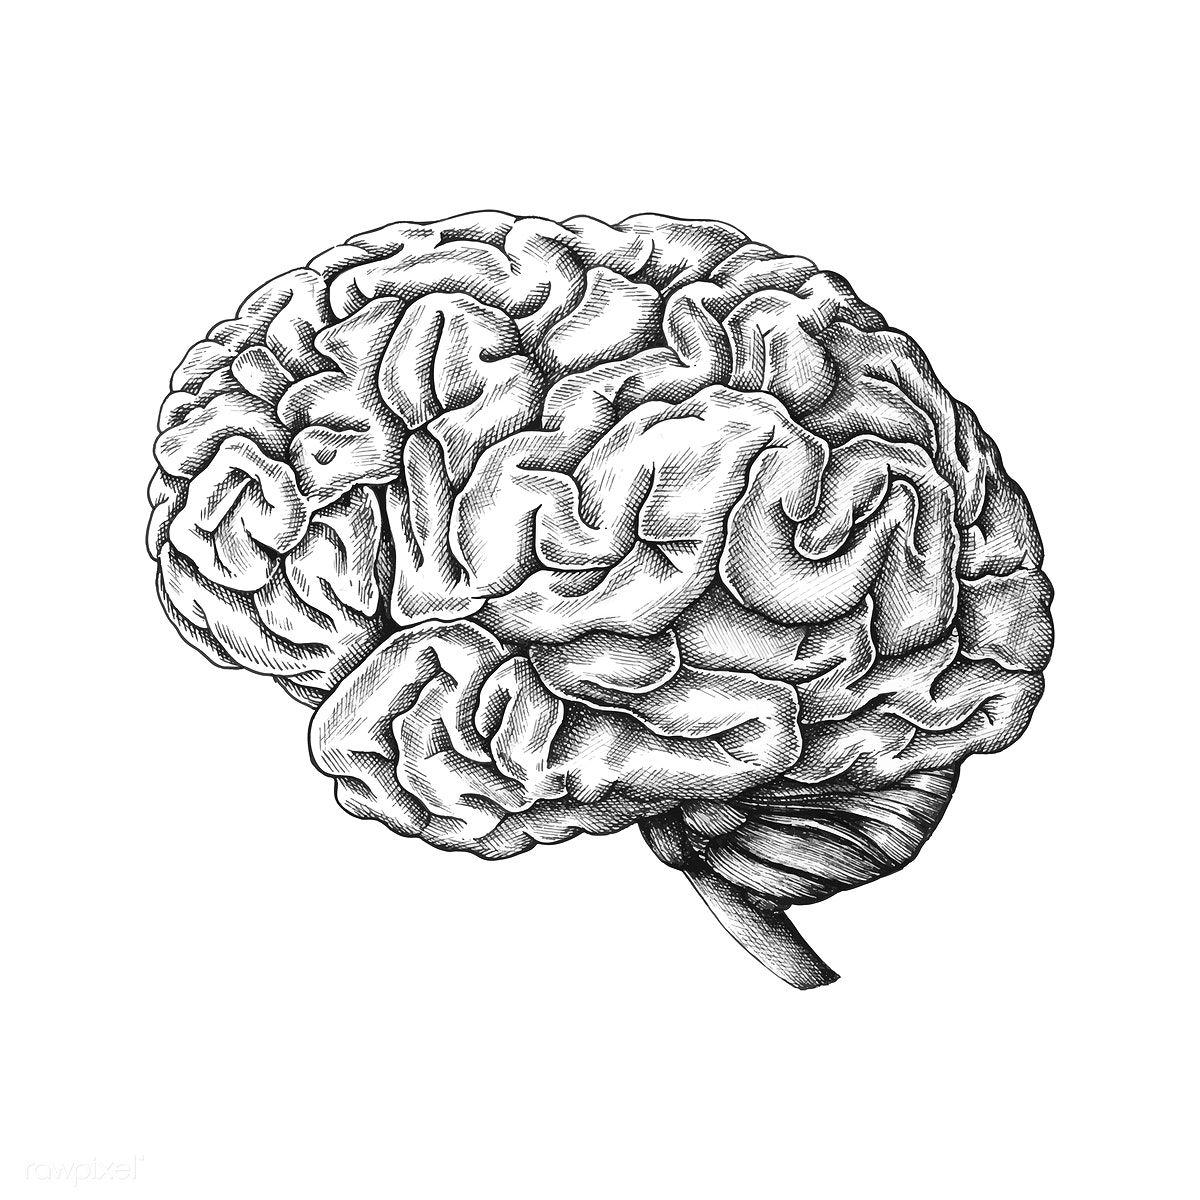 Download premium vector of Hand drawn human brain 410908